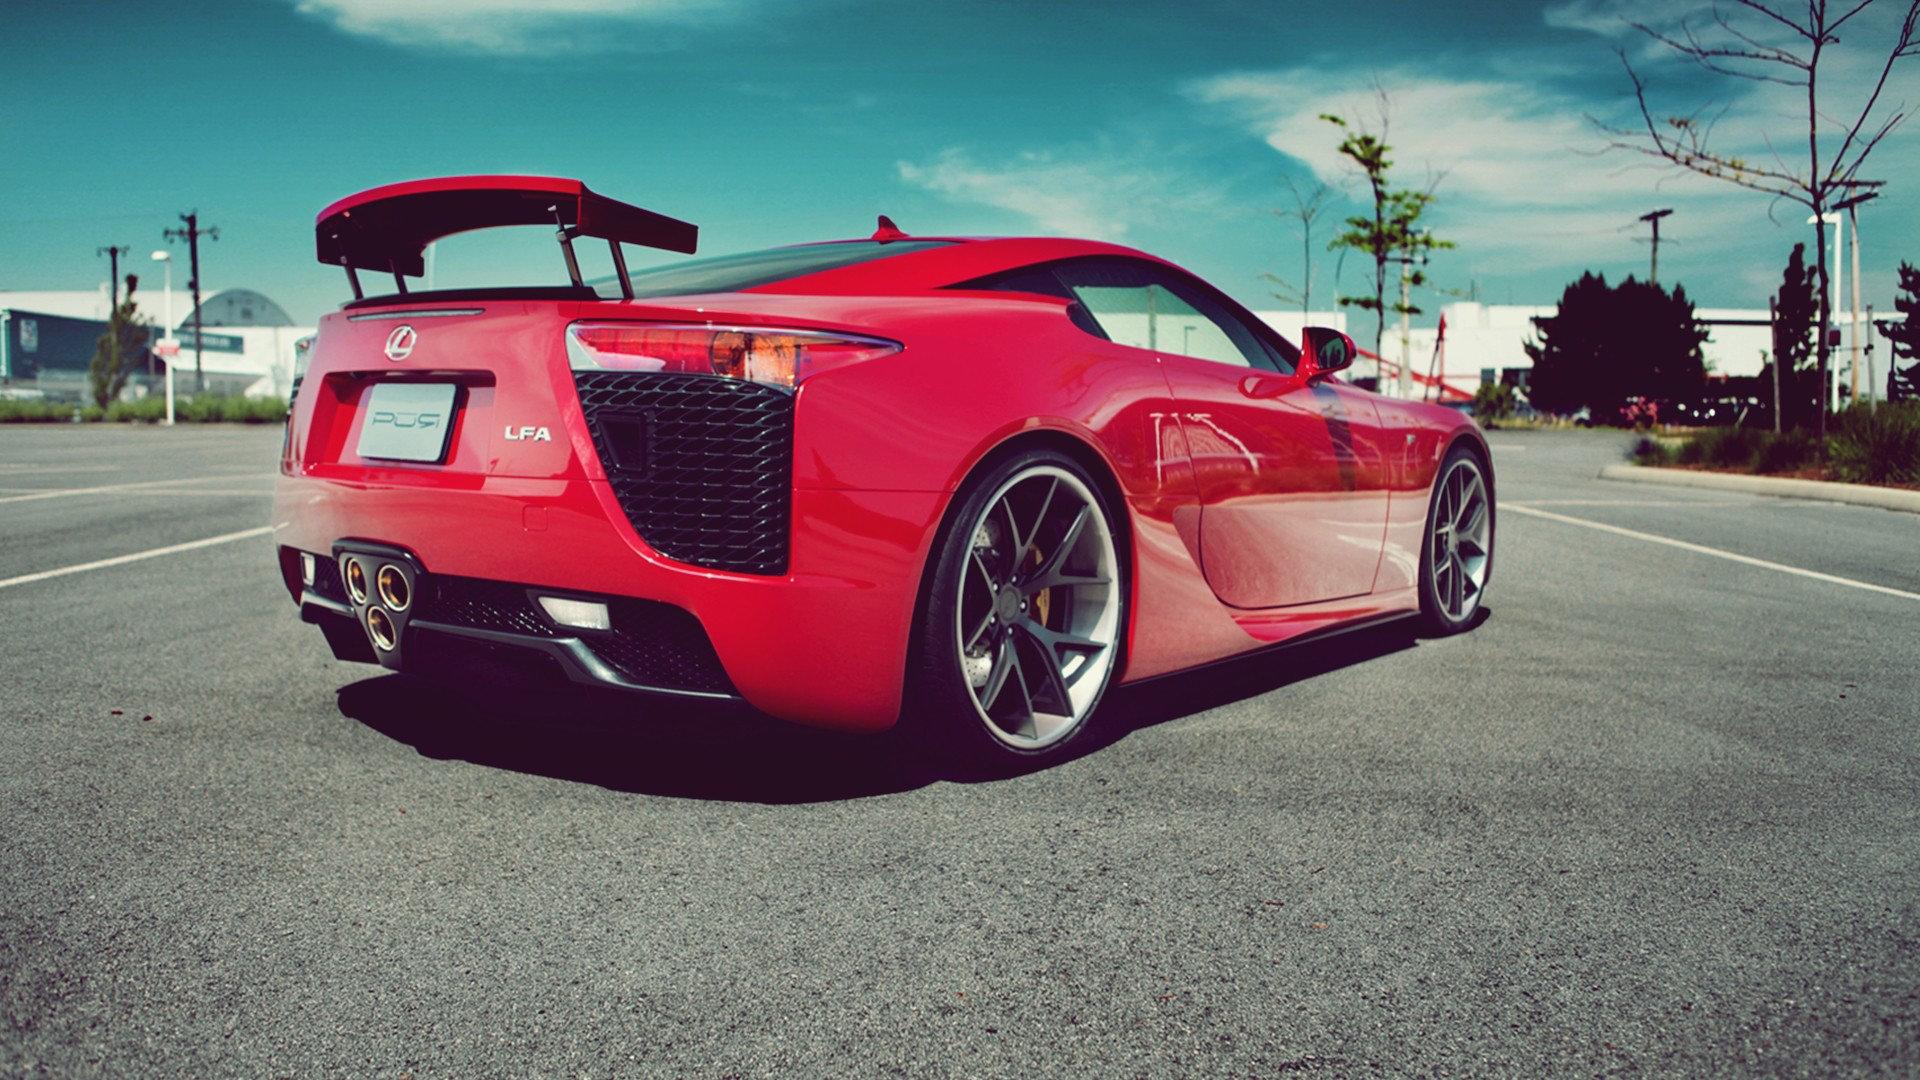 Free Download Lexus Lfa Background Id 161652 Full Hd 1080p For Desktop